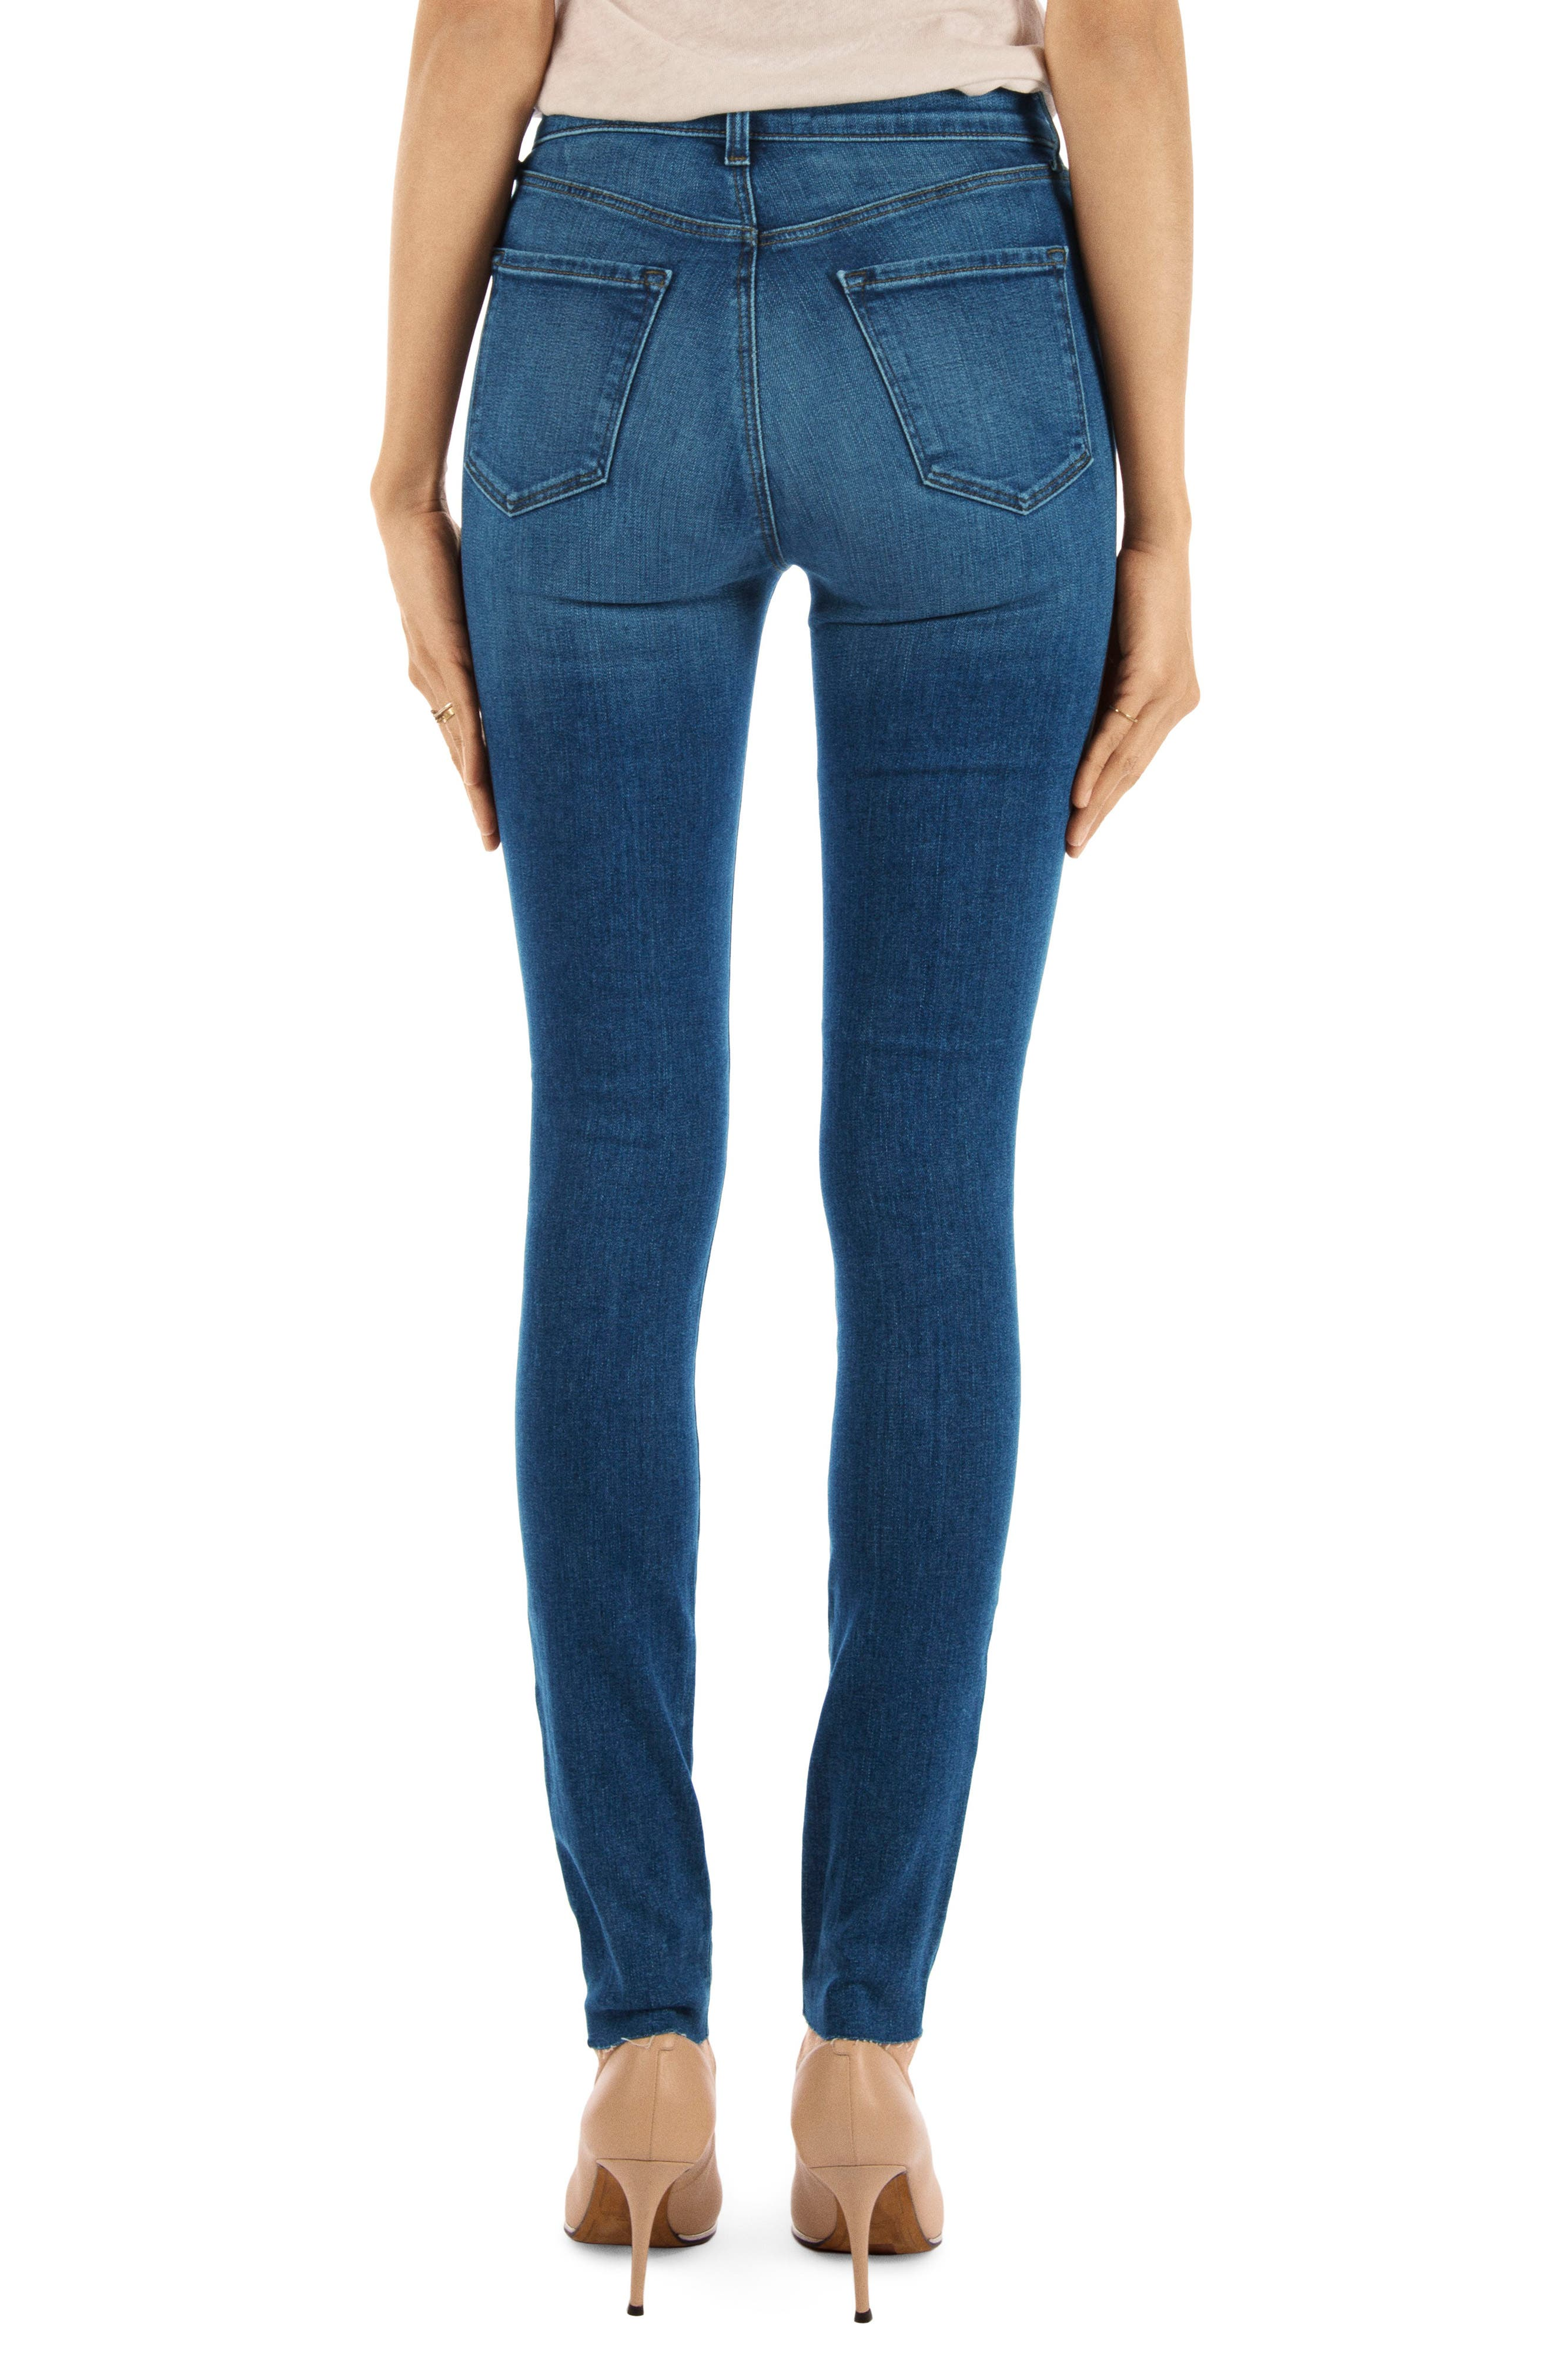 Carolina Super High Waist Skinny Jeans,                             Alternate thumbnail 2, color,                             LOVESICK